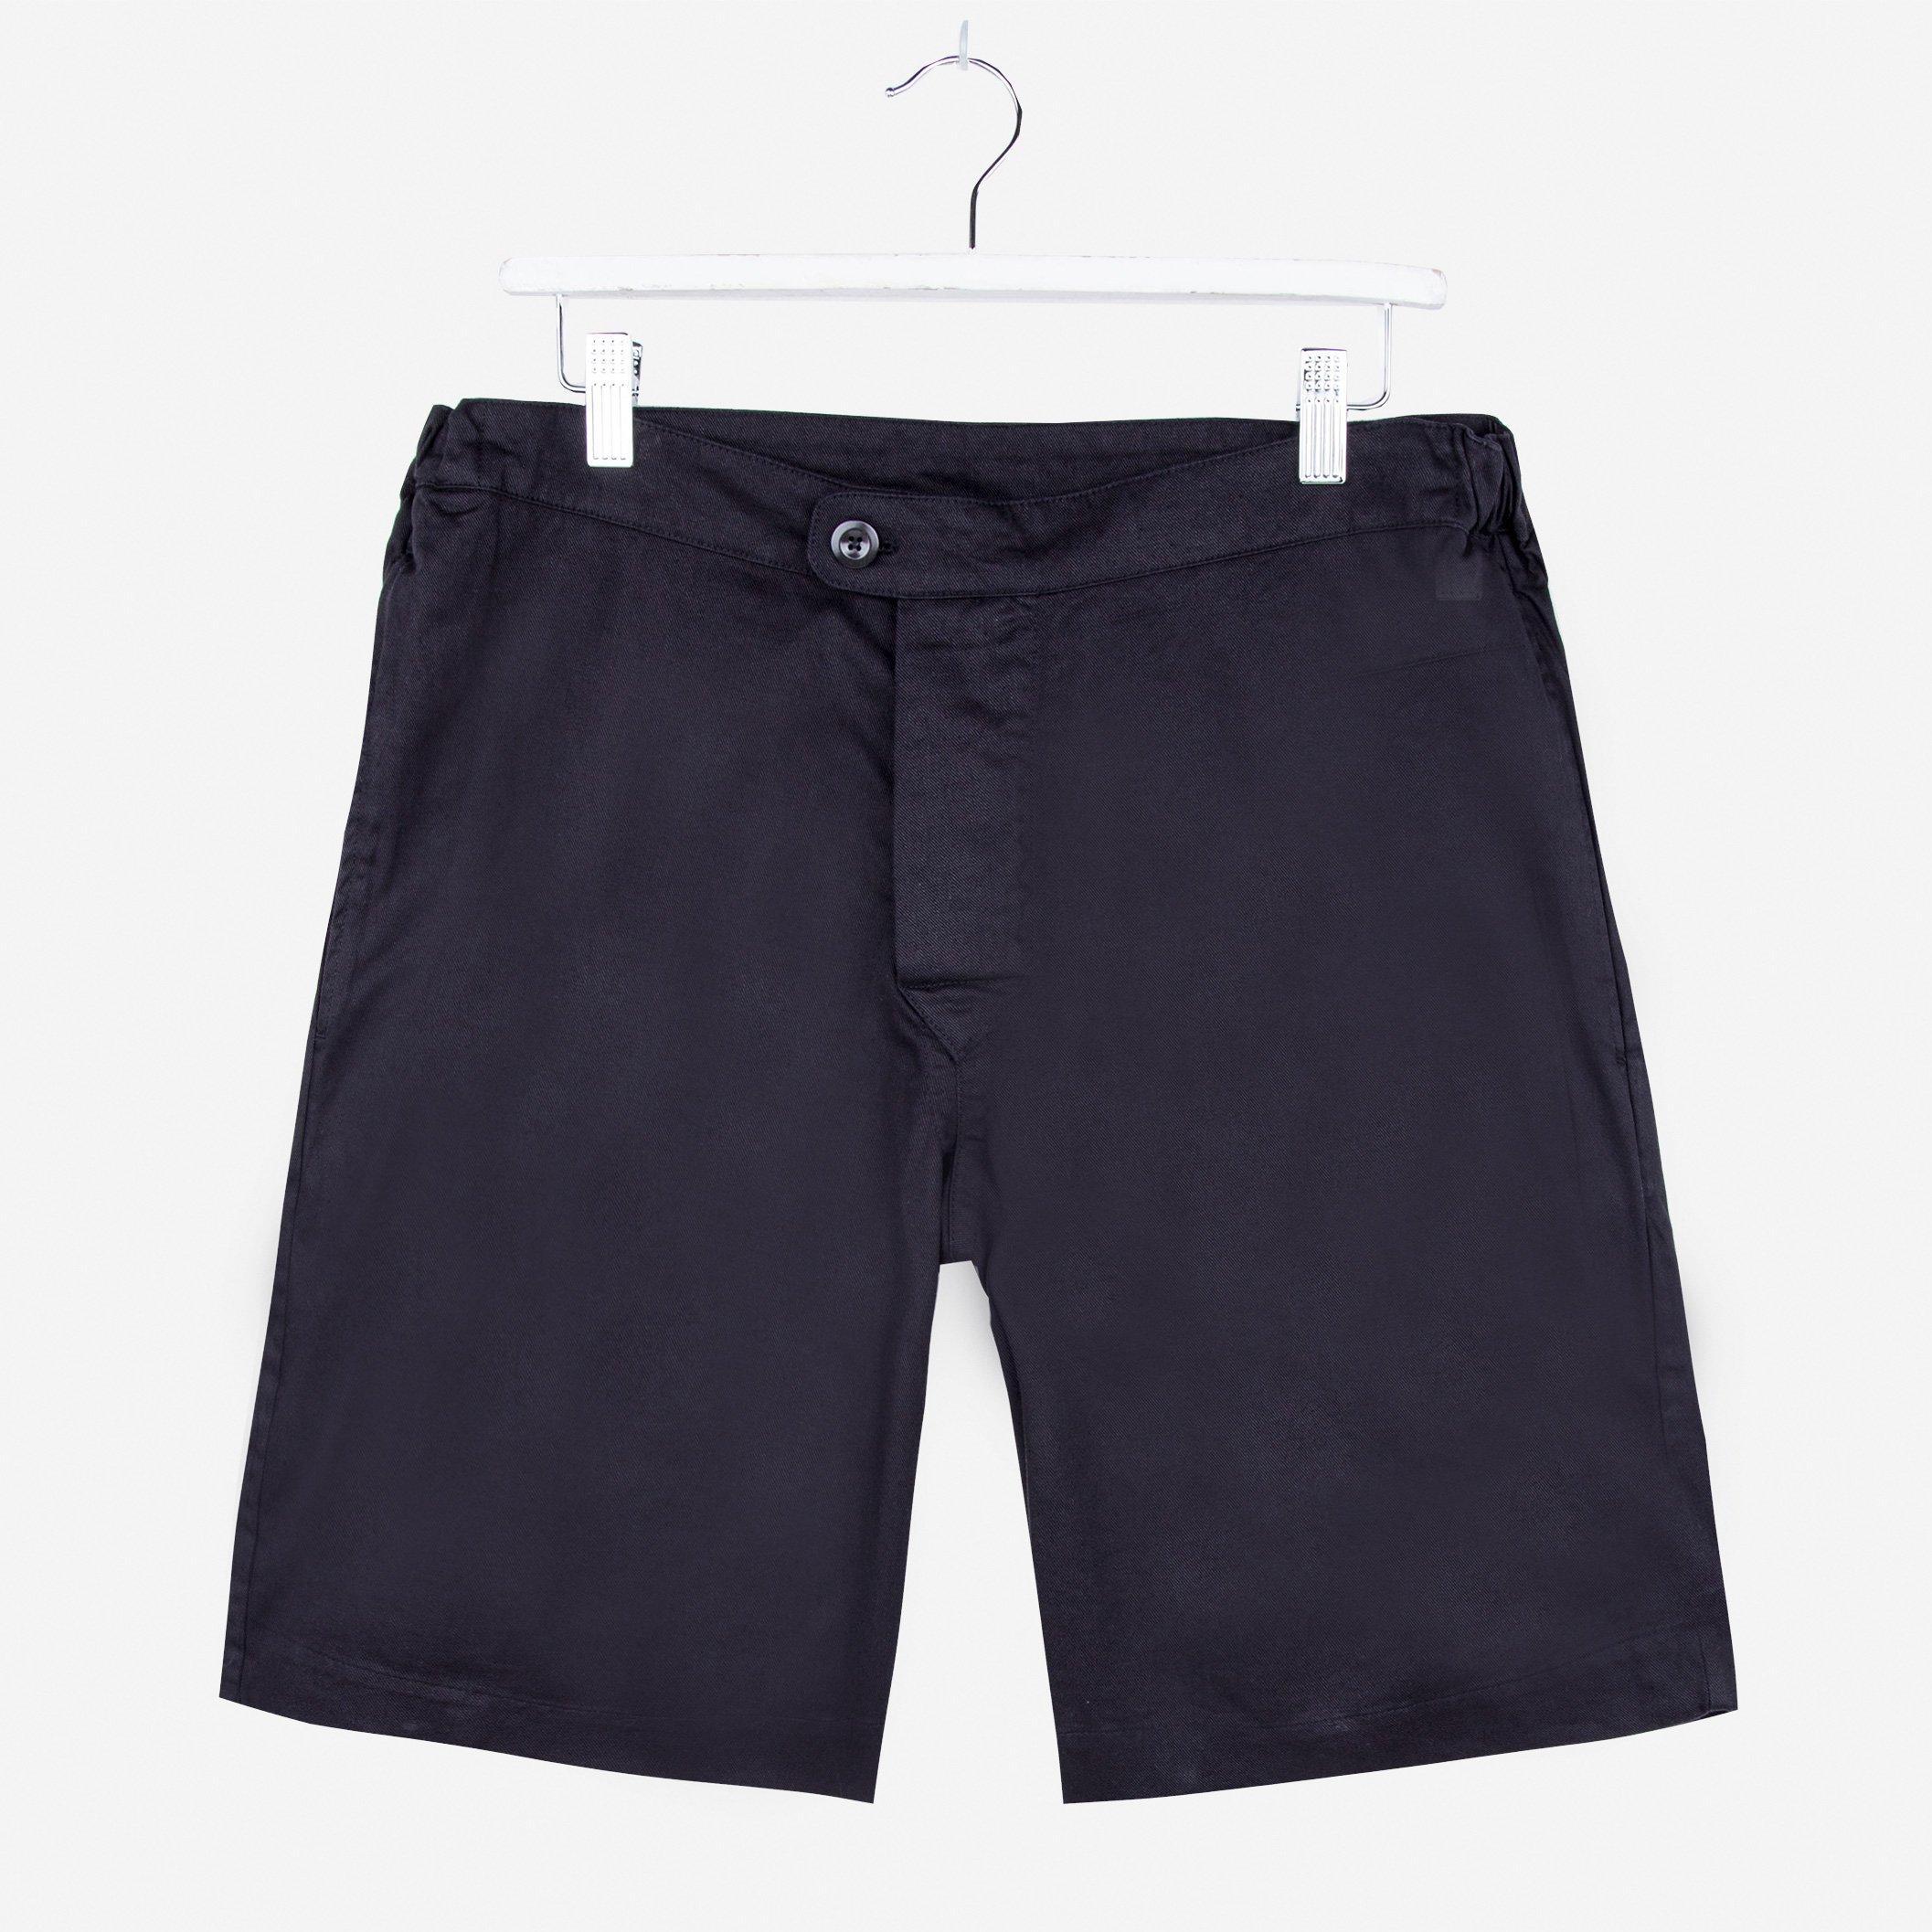 MHL Gym Shorts Japanese Drill